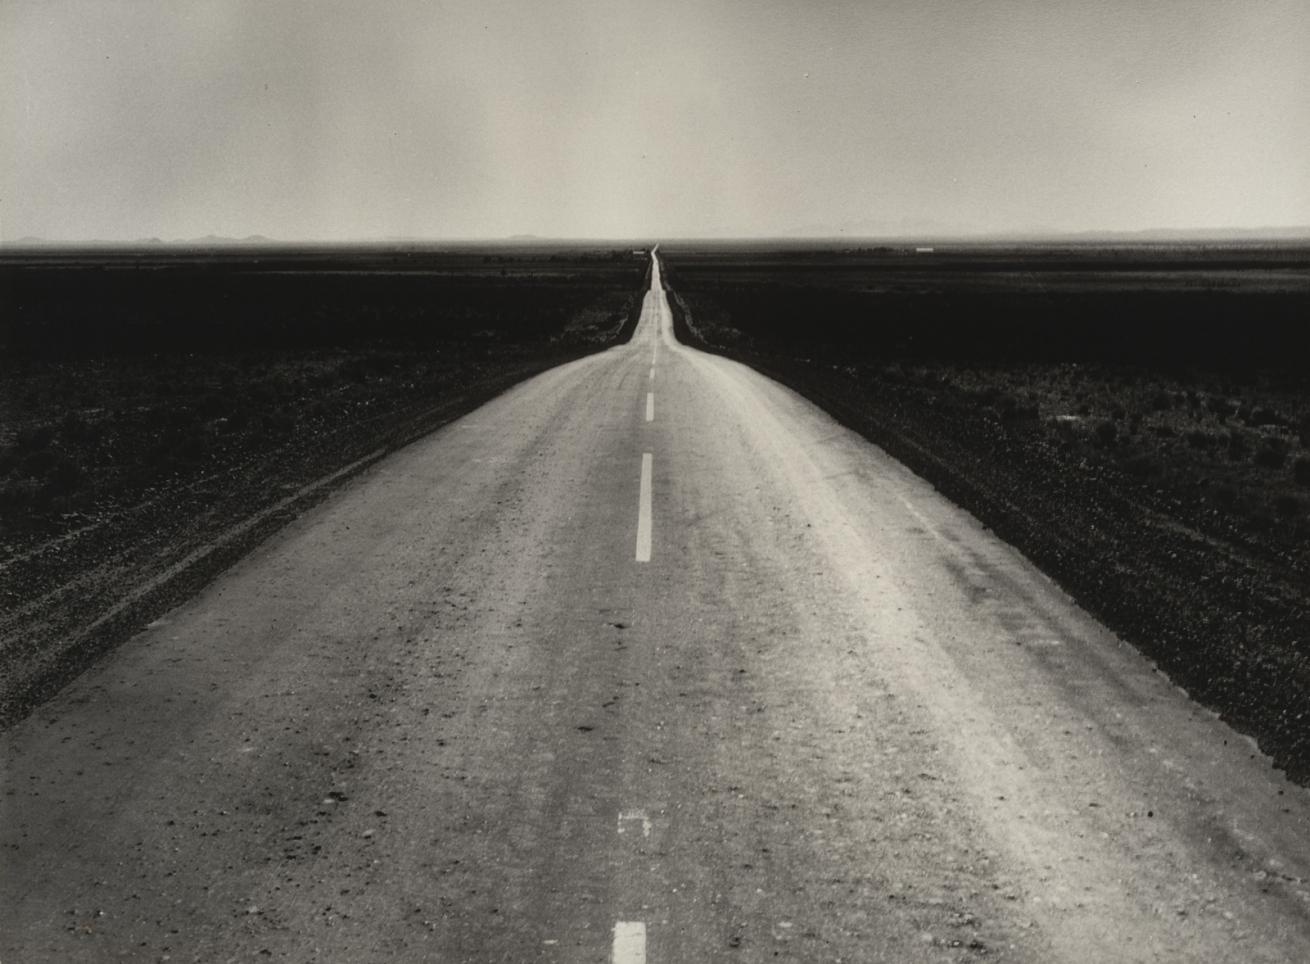 Fotó: Dorothea Lange: The Road West, New Mexico, 1938